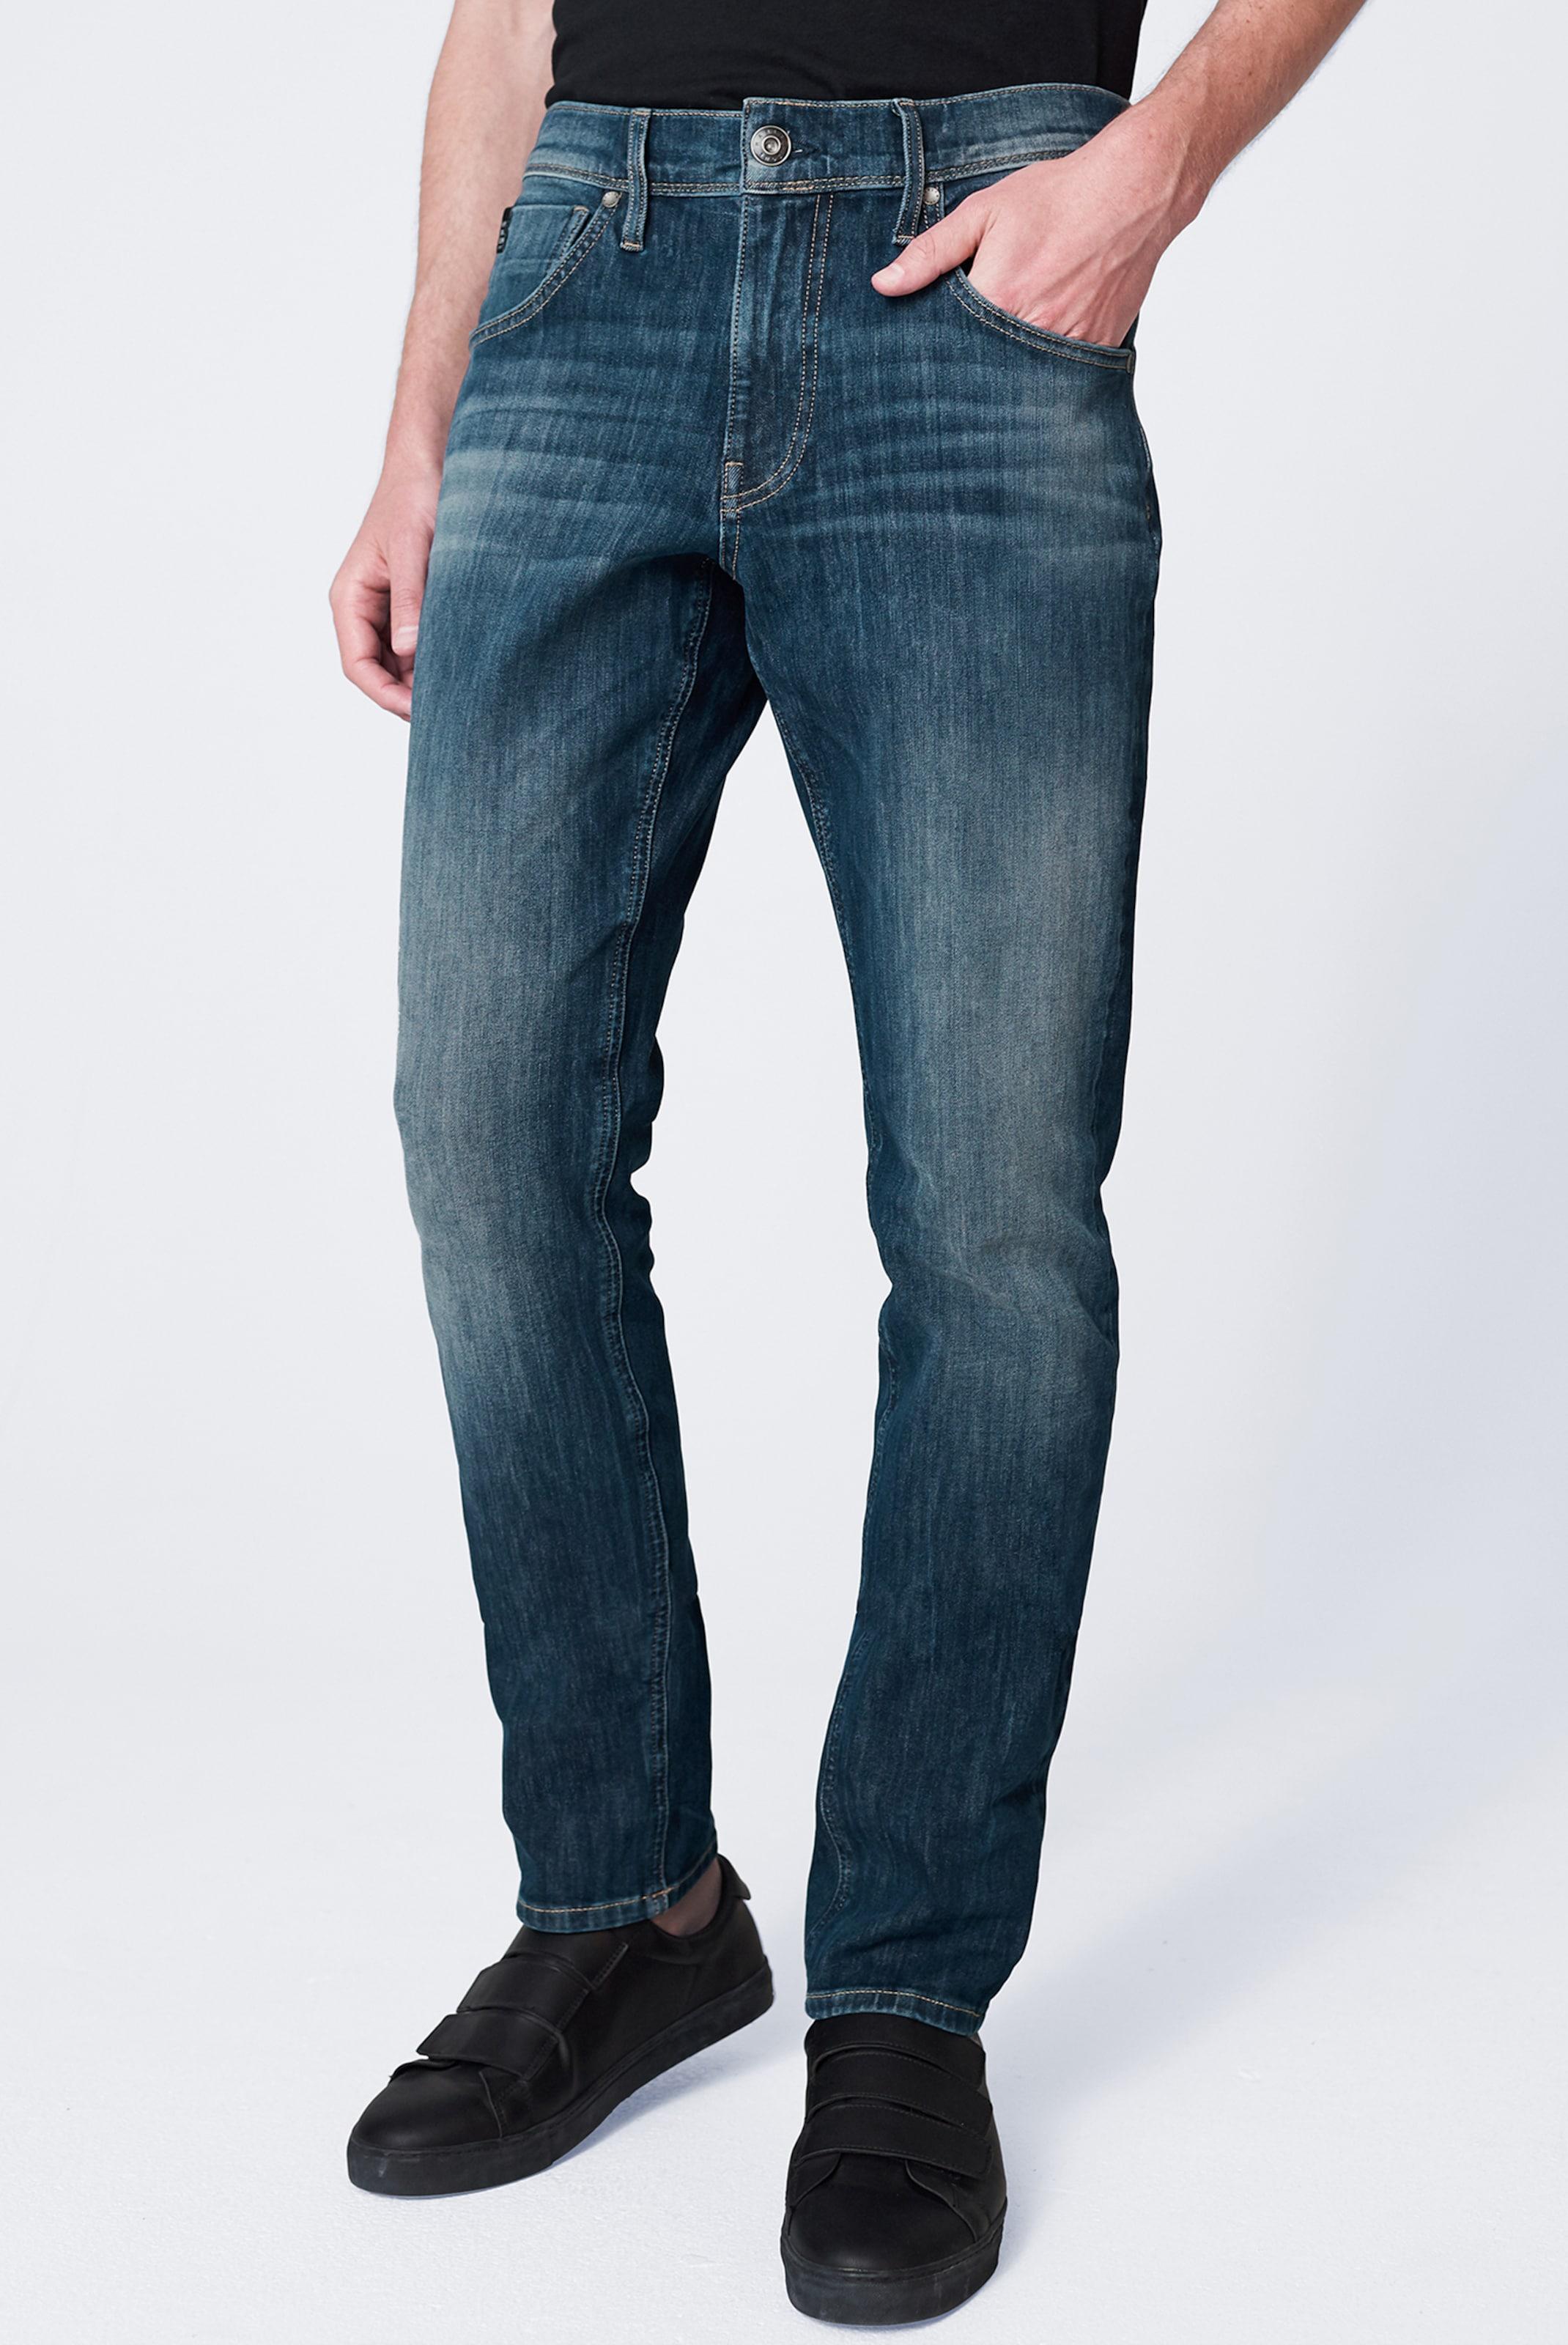 Harlem Soul Jeans in blue denim Jeans I00045257BLU0490HJ3228